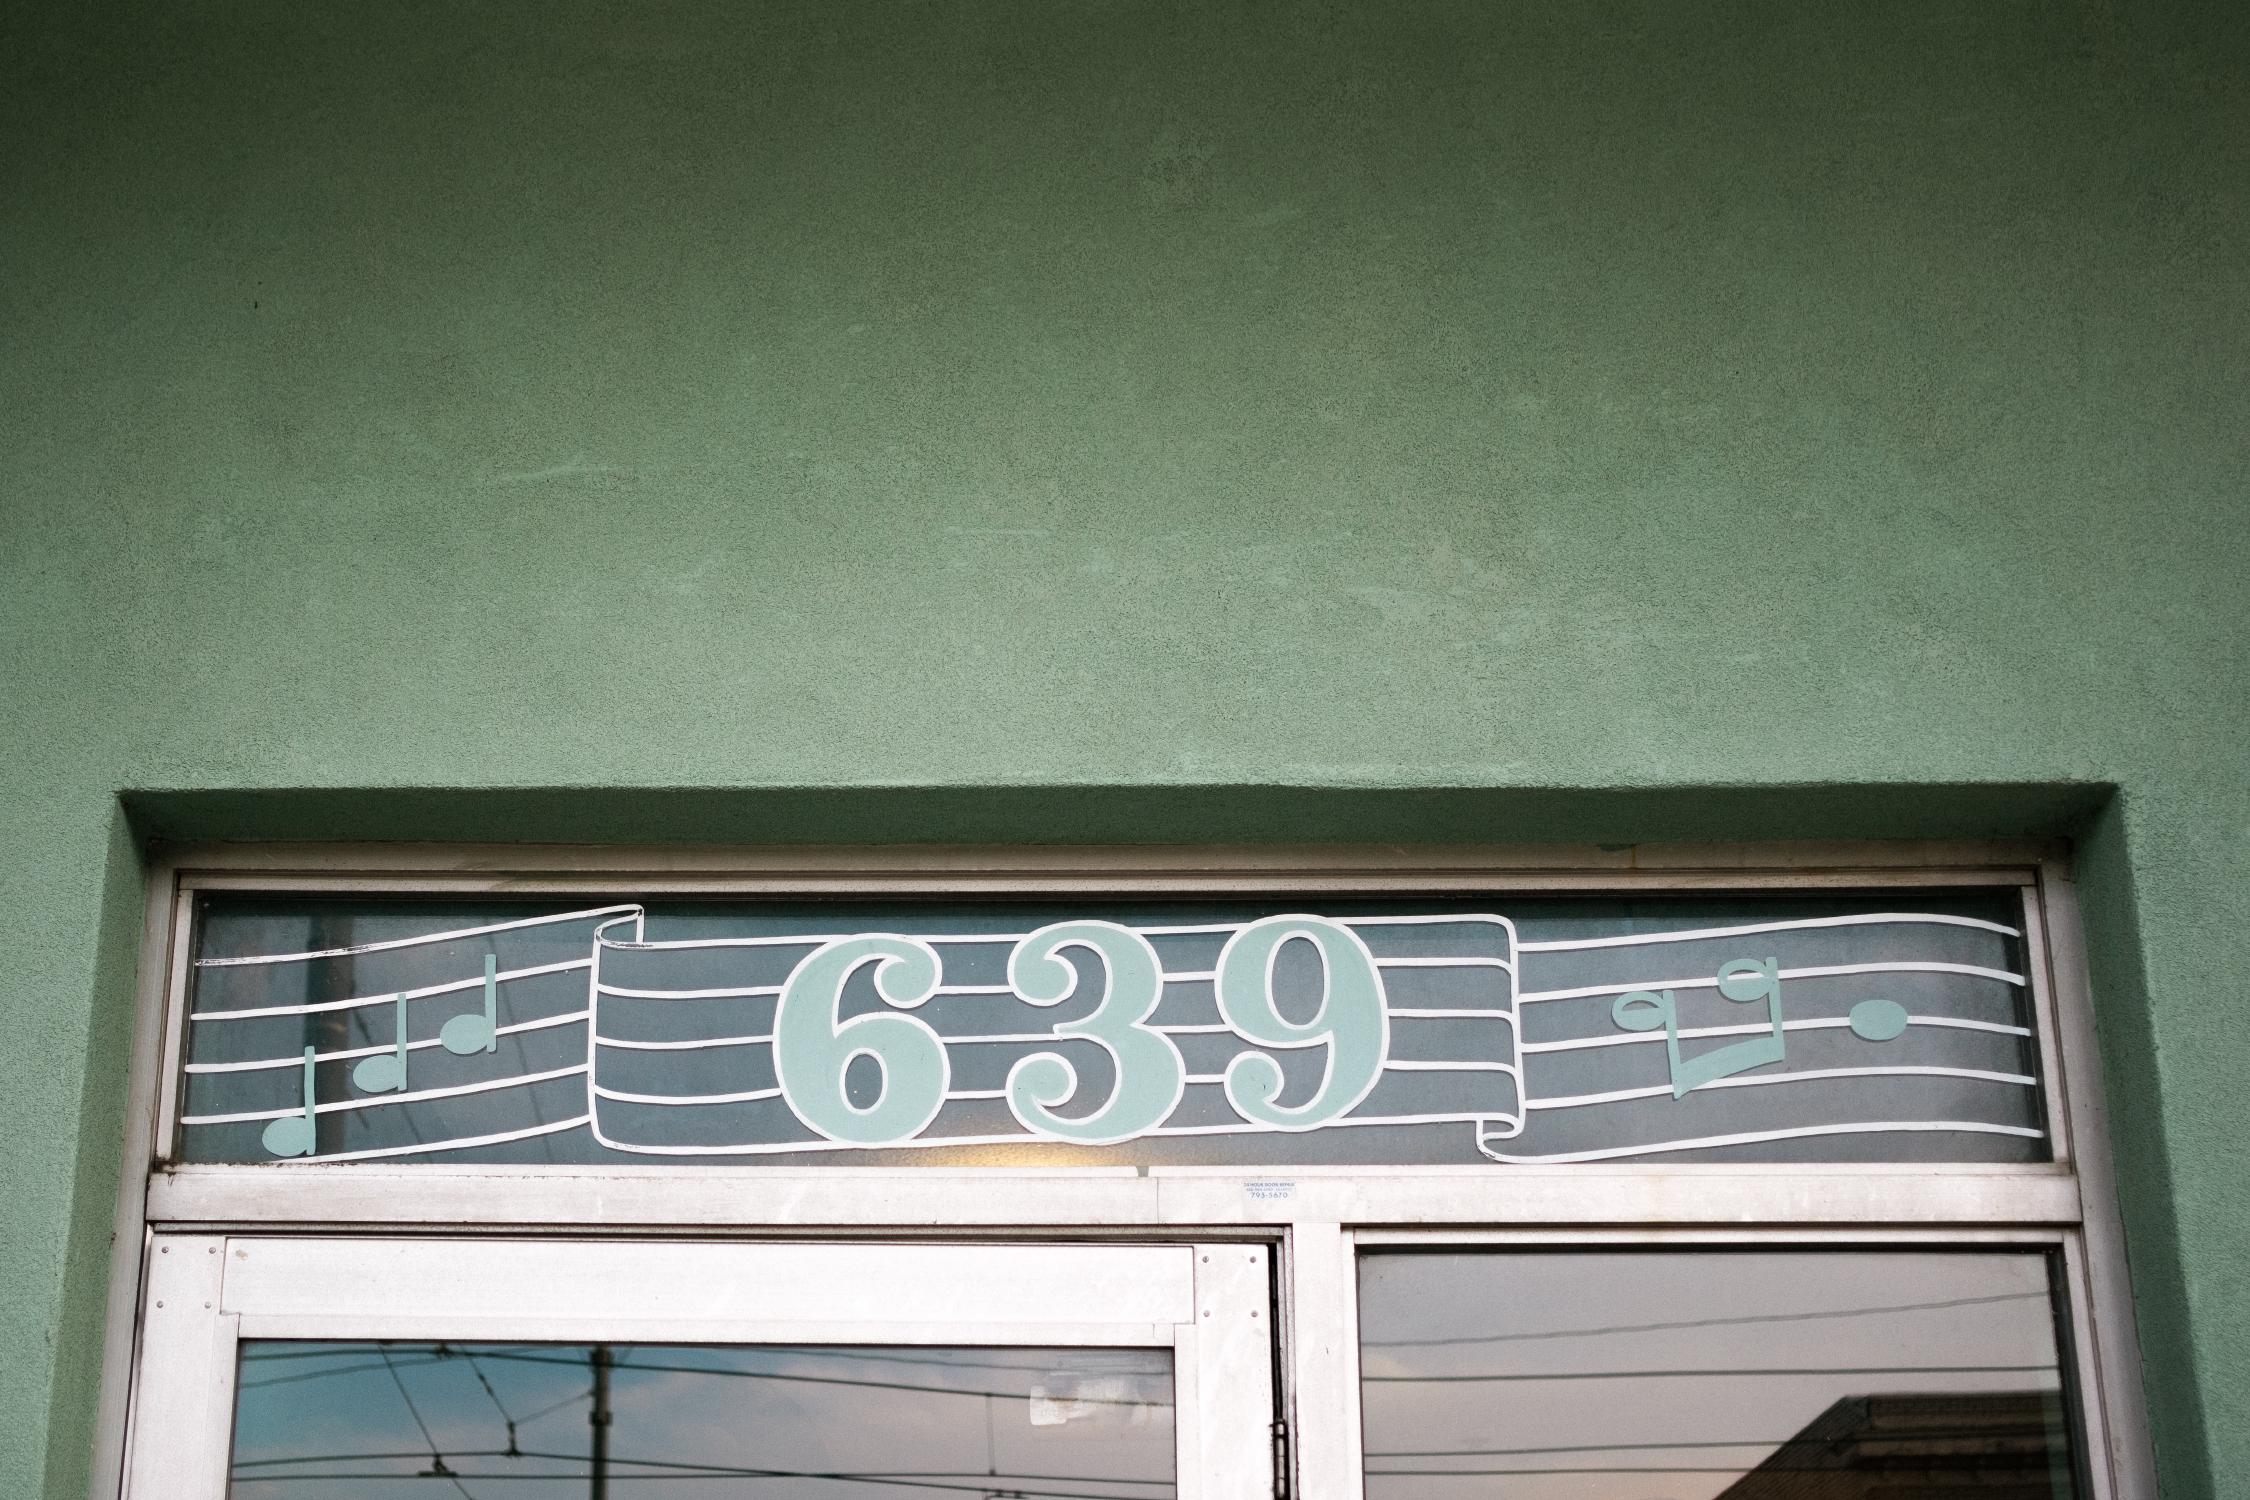 Entrance to Sam Phillips Recording Studio in Memphis, TN